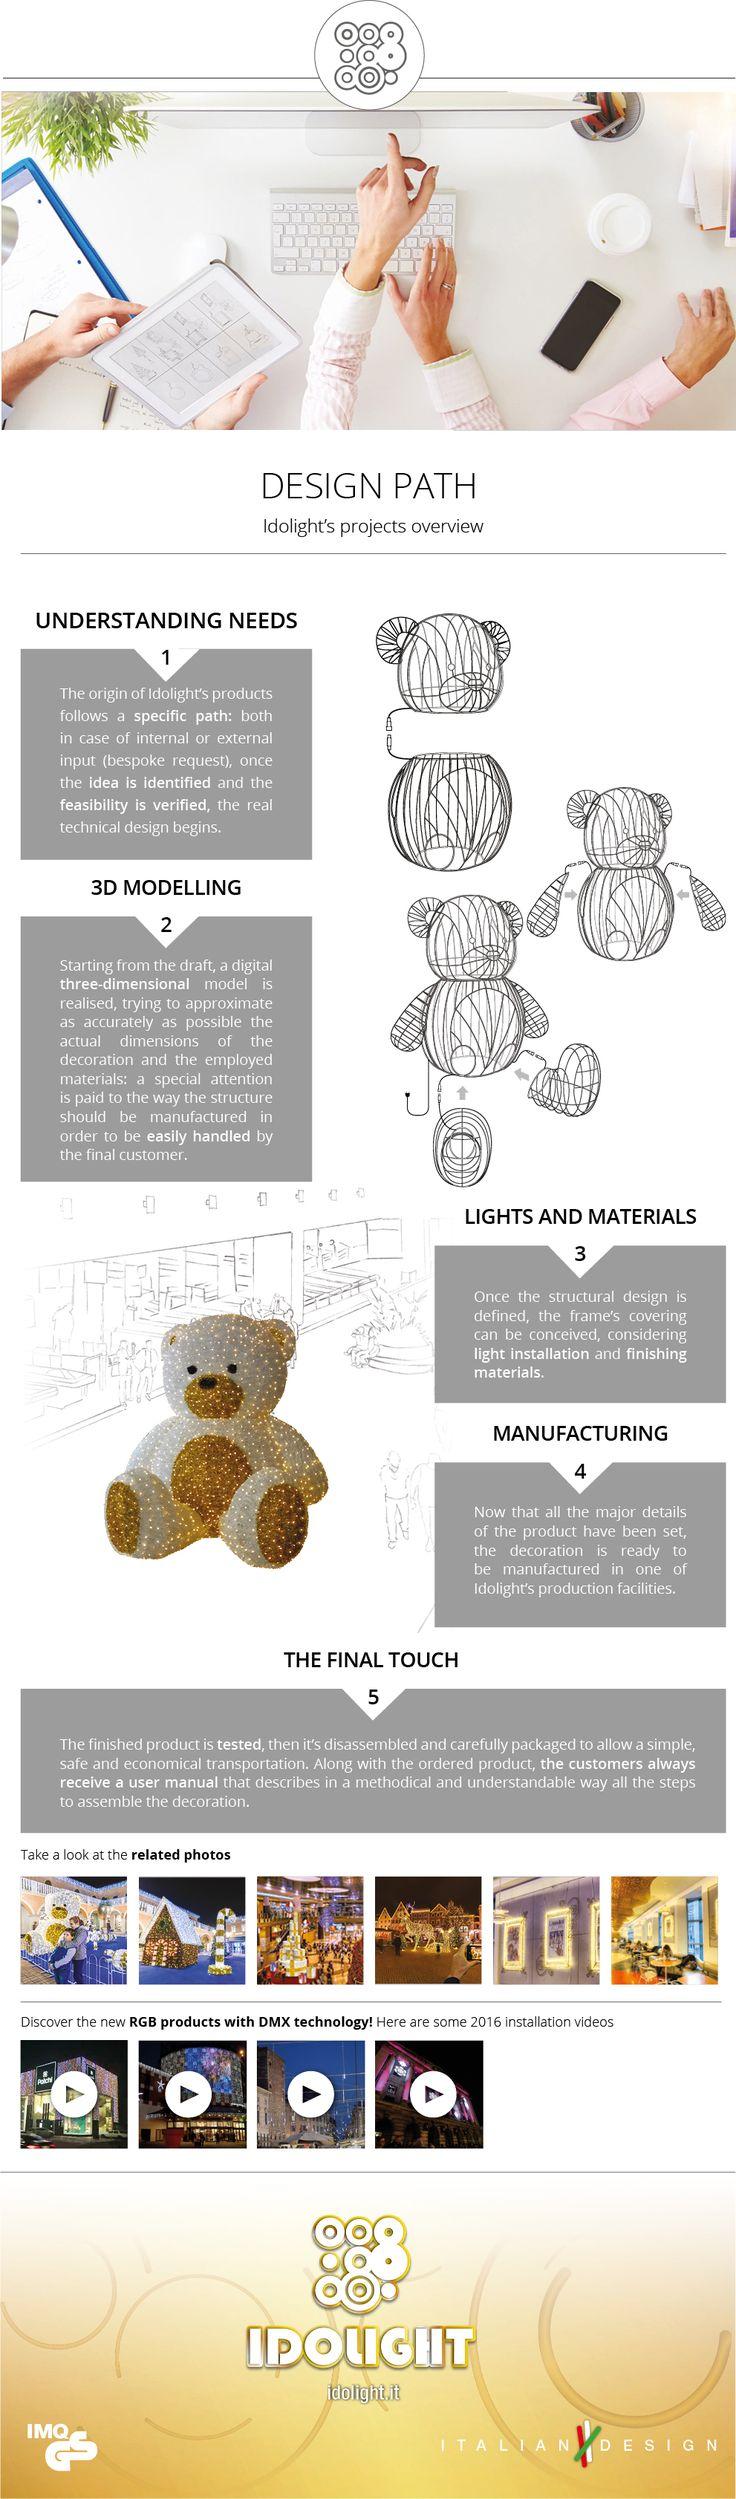 Idolight's projects overview  #idolight #madeinitaly #italiande